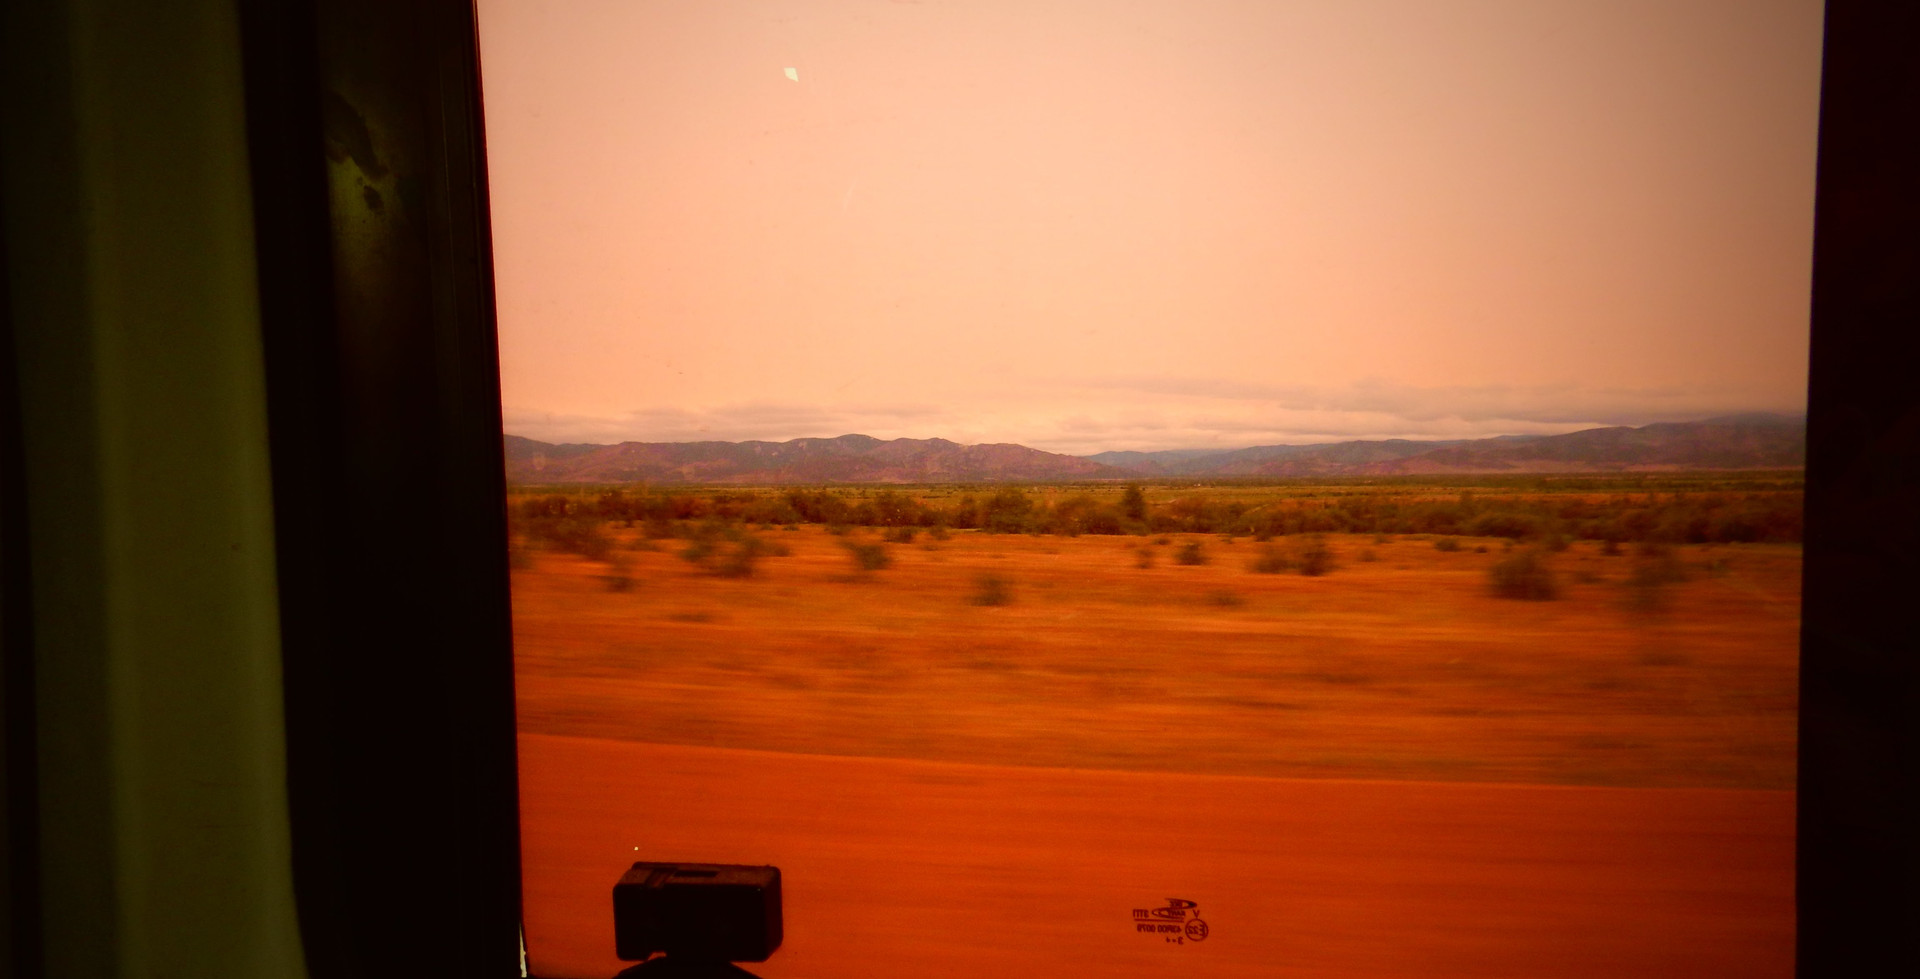 Minibus, désert de Gobi